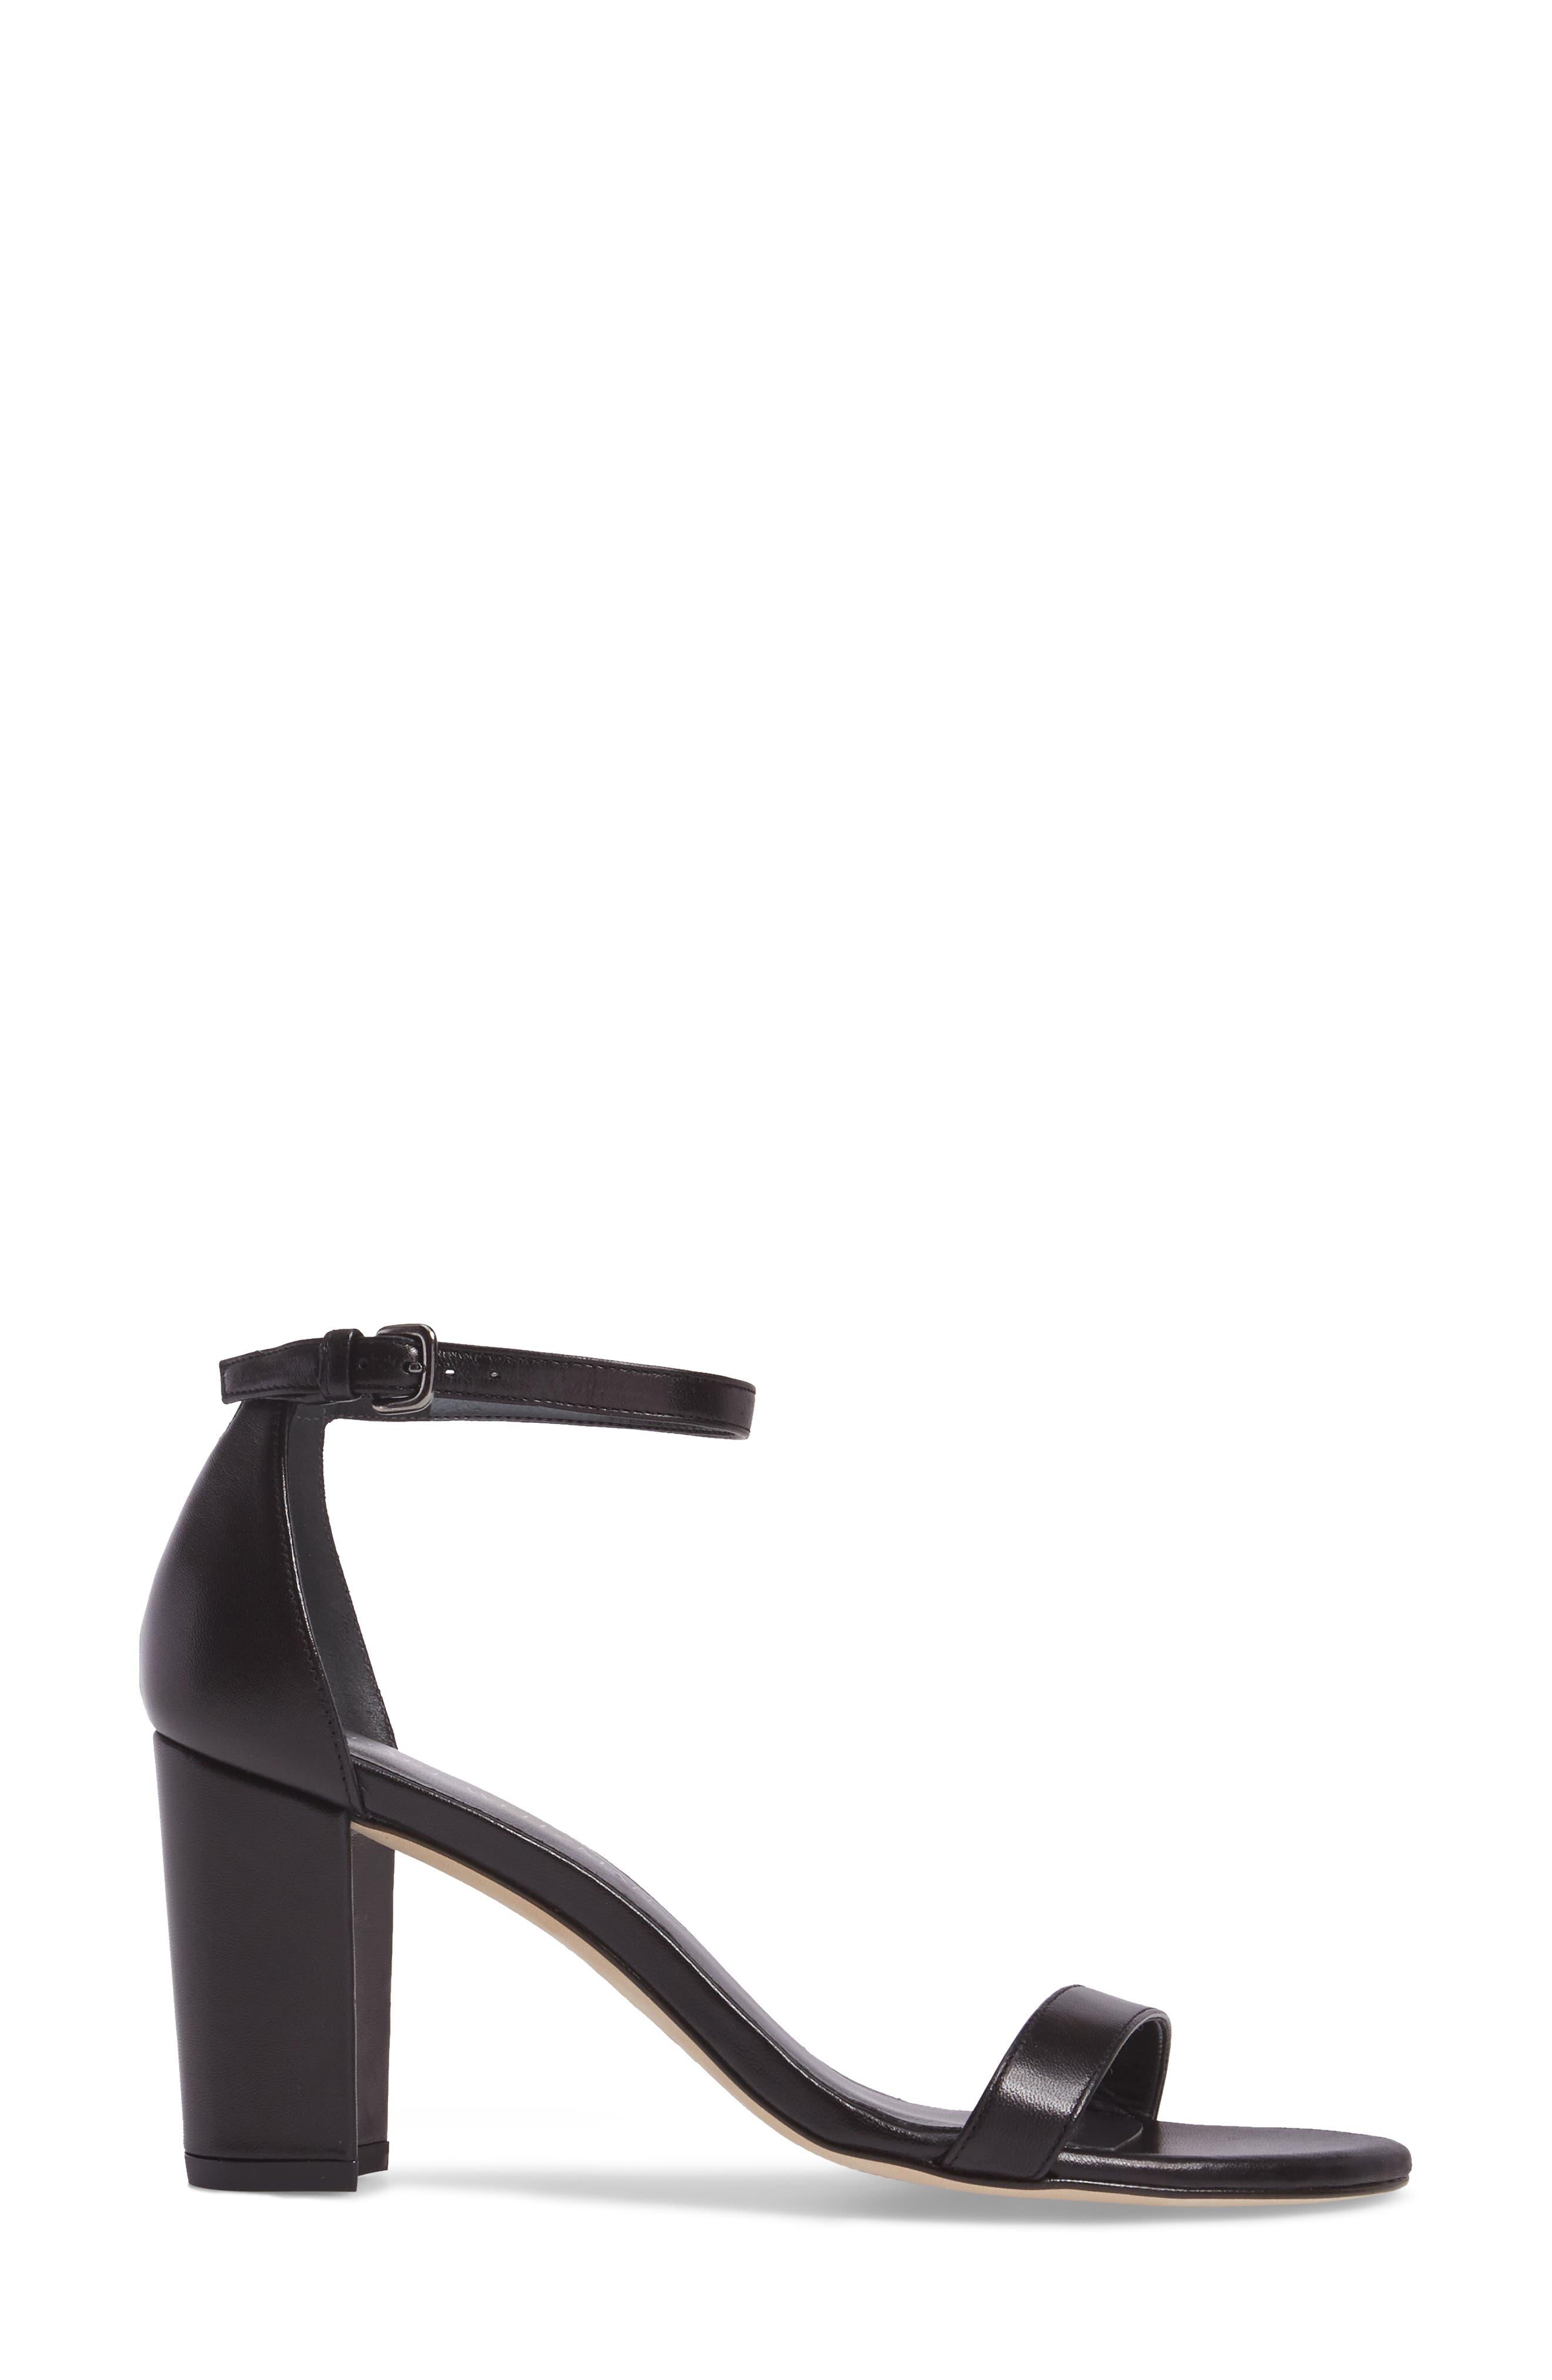 NearlyNude Ankle Strap Sandal,                             Alternate thumbnail 6, color,                             Black Nappa